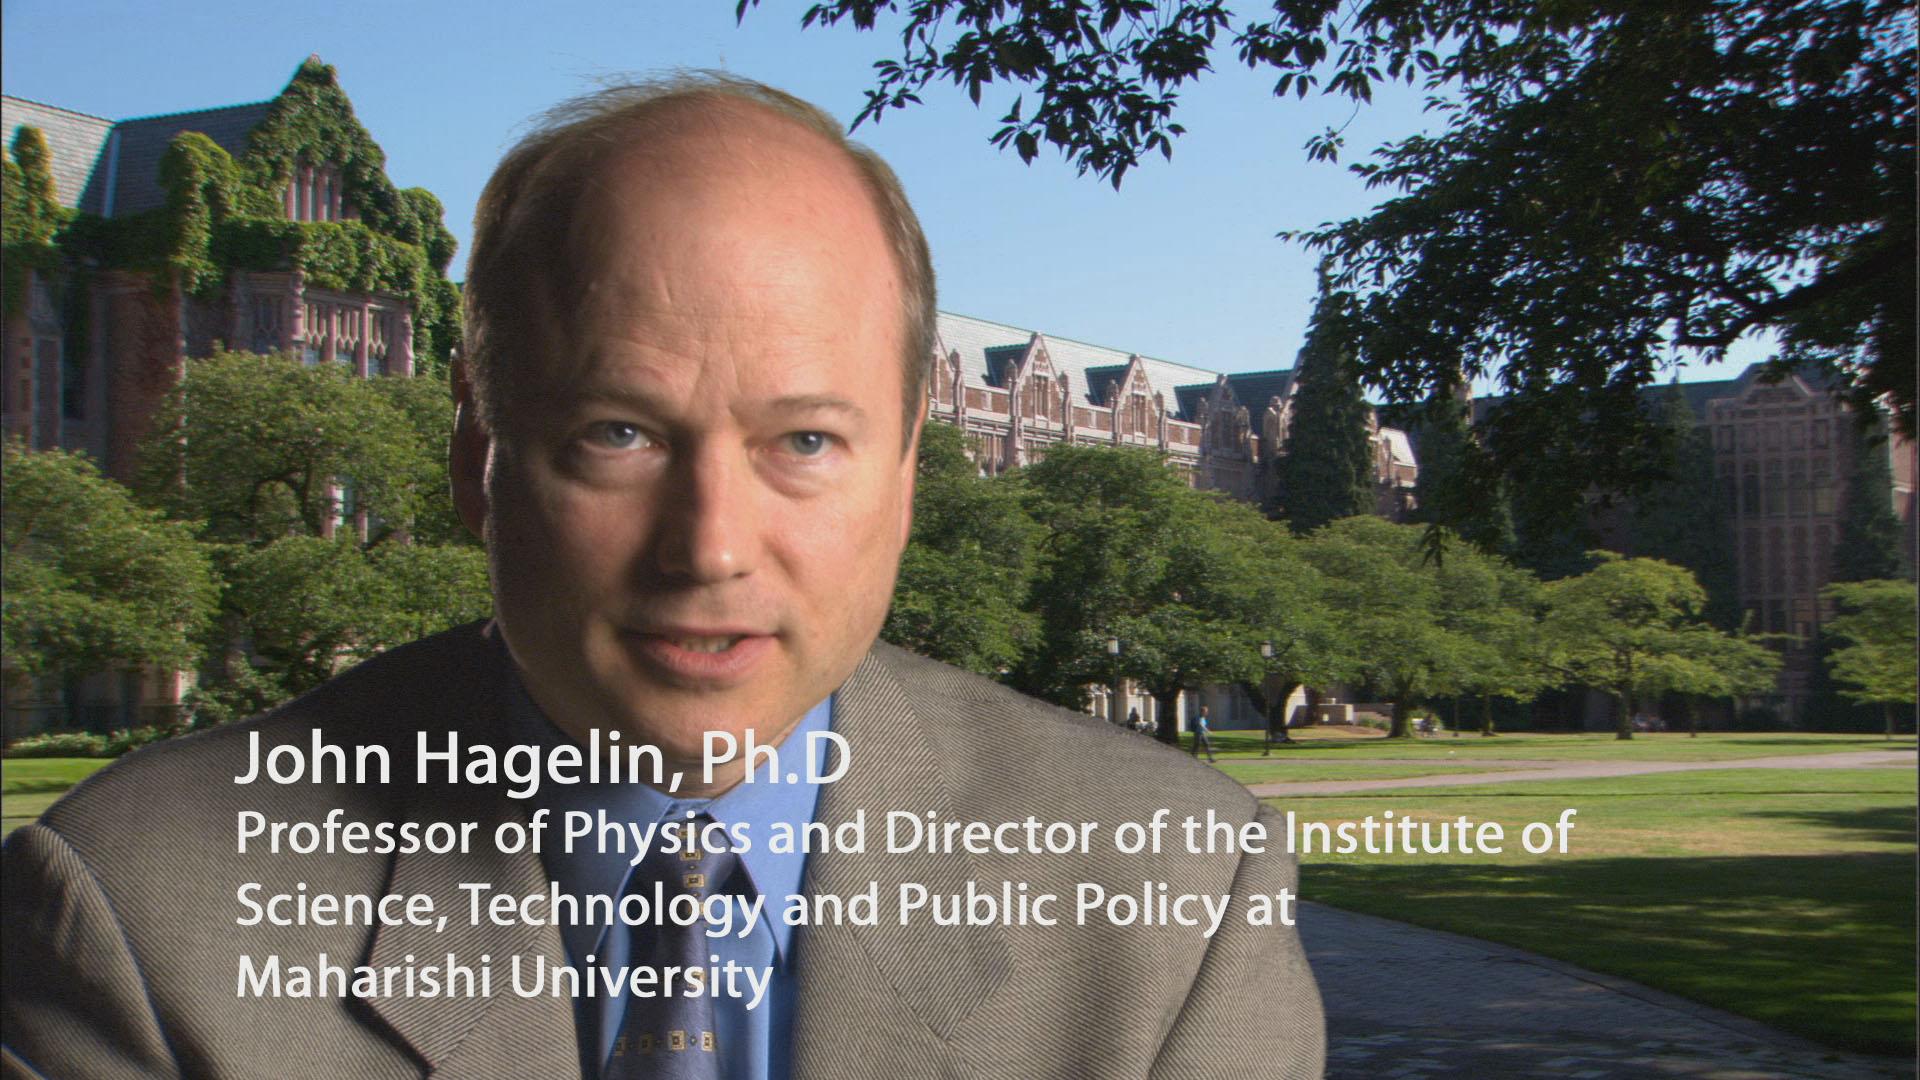 Dr. John Hagelin, Ph.D.'s Biography